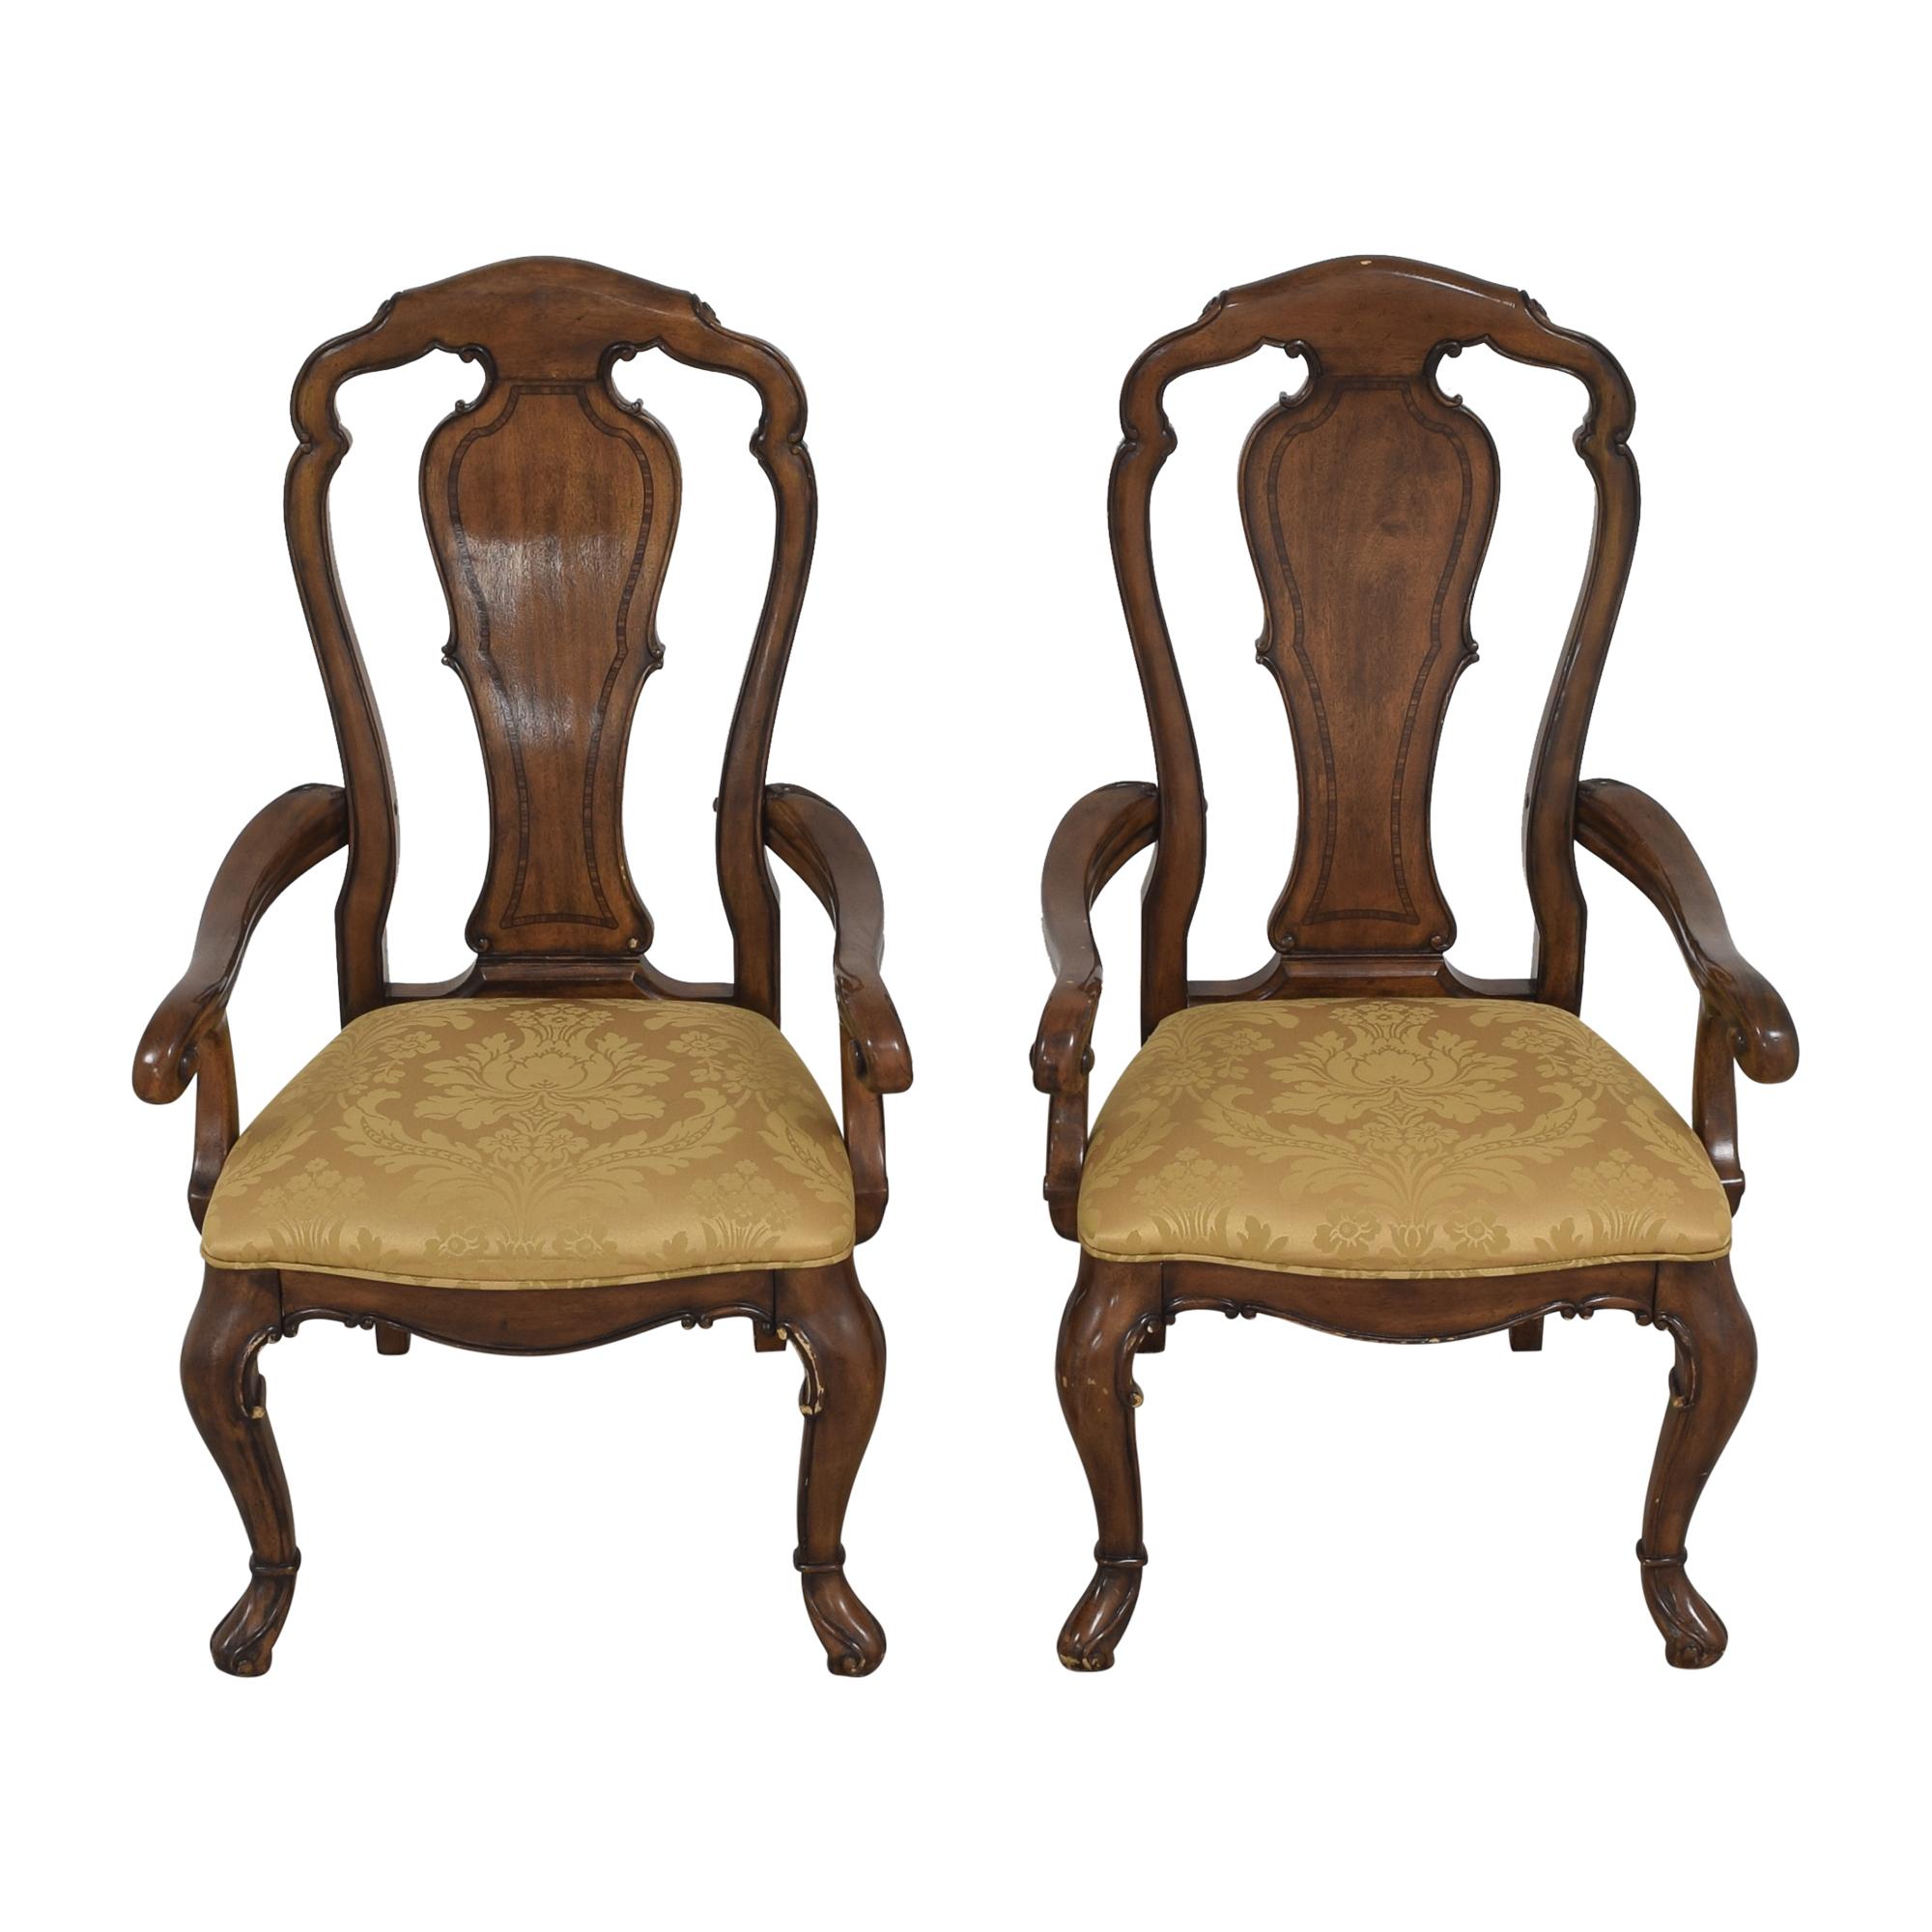 buy Thomasville Ernest Hemingway Granada Dining Arm Chairs Thomasville